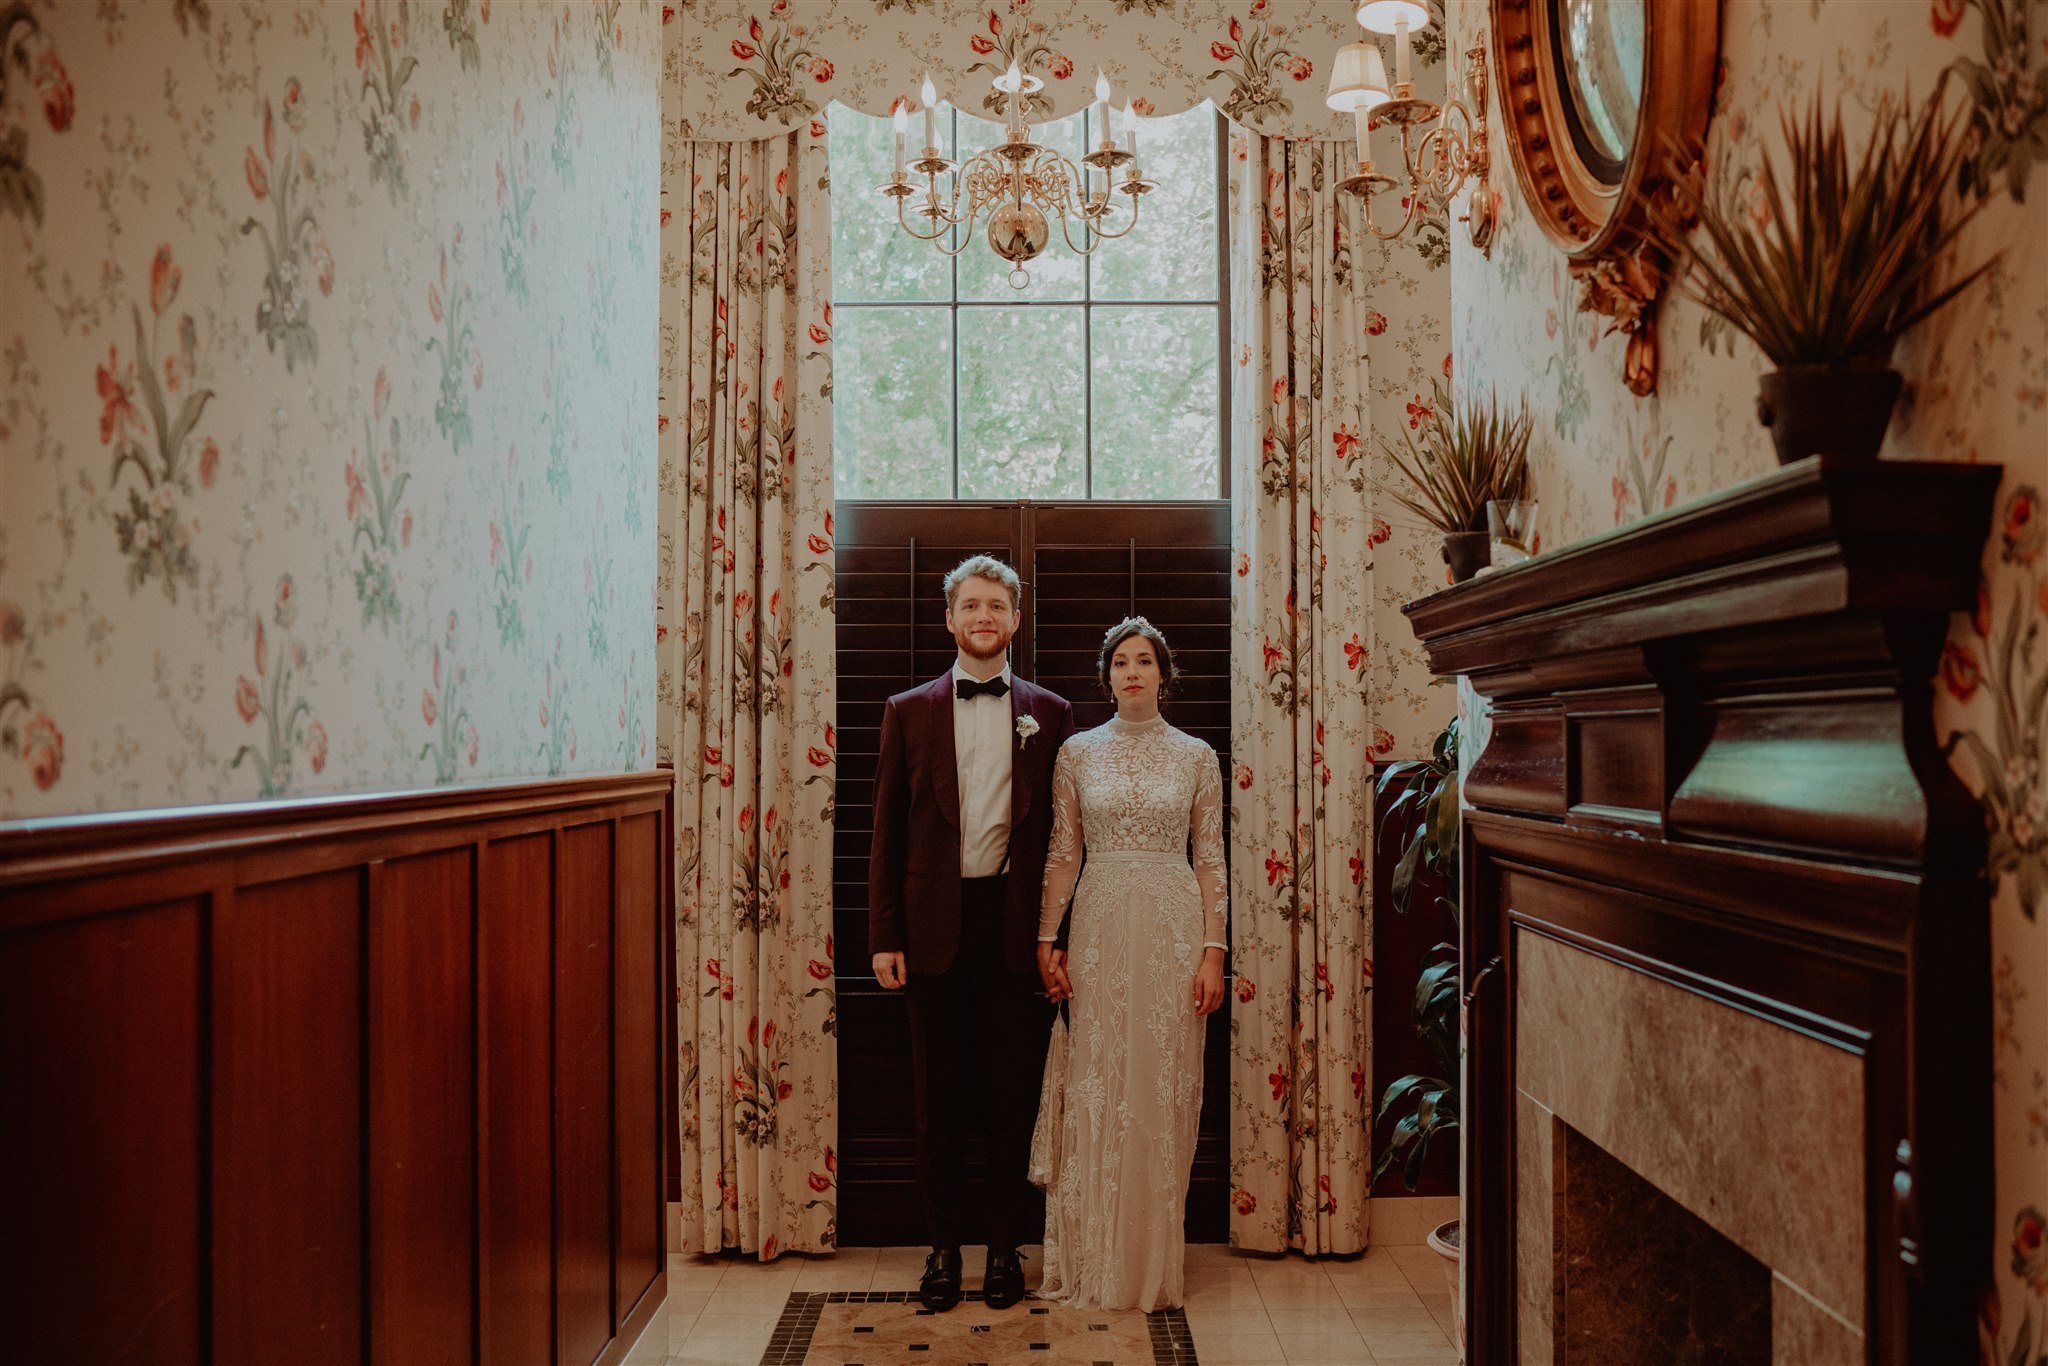 Chellise_Michael_Photography_Hudson_Valley_Wedding_Photographer_Otesaga_Hotel-4018.jpg